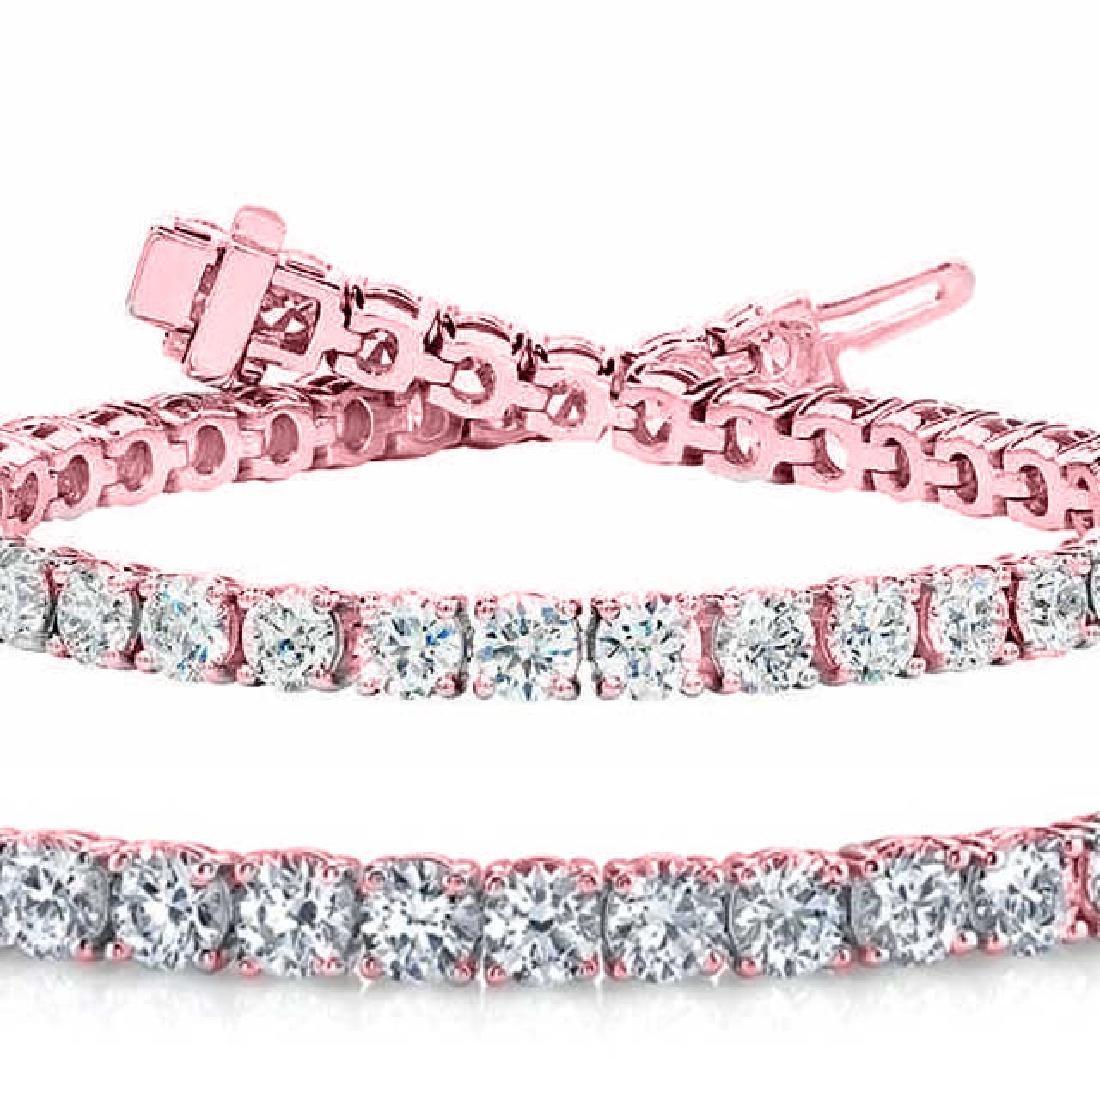 7ct VS-SI Diamond Tennis Bracelet 14K Rose Gold